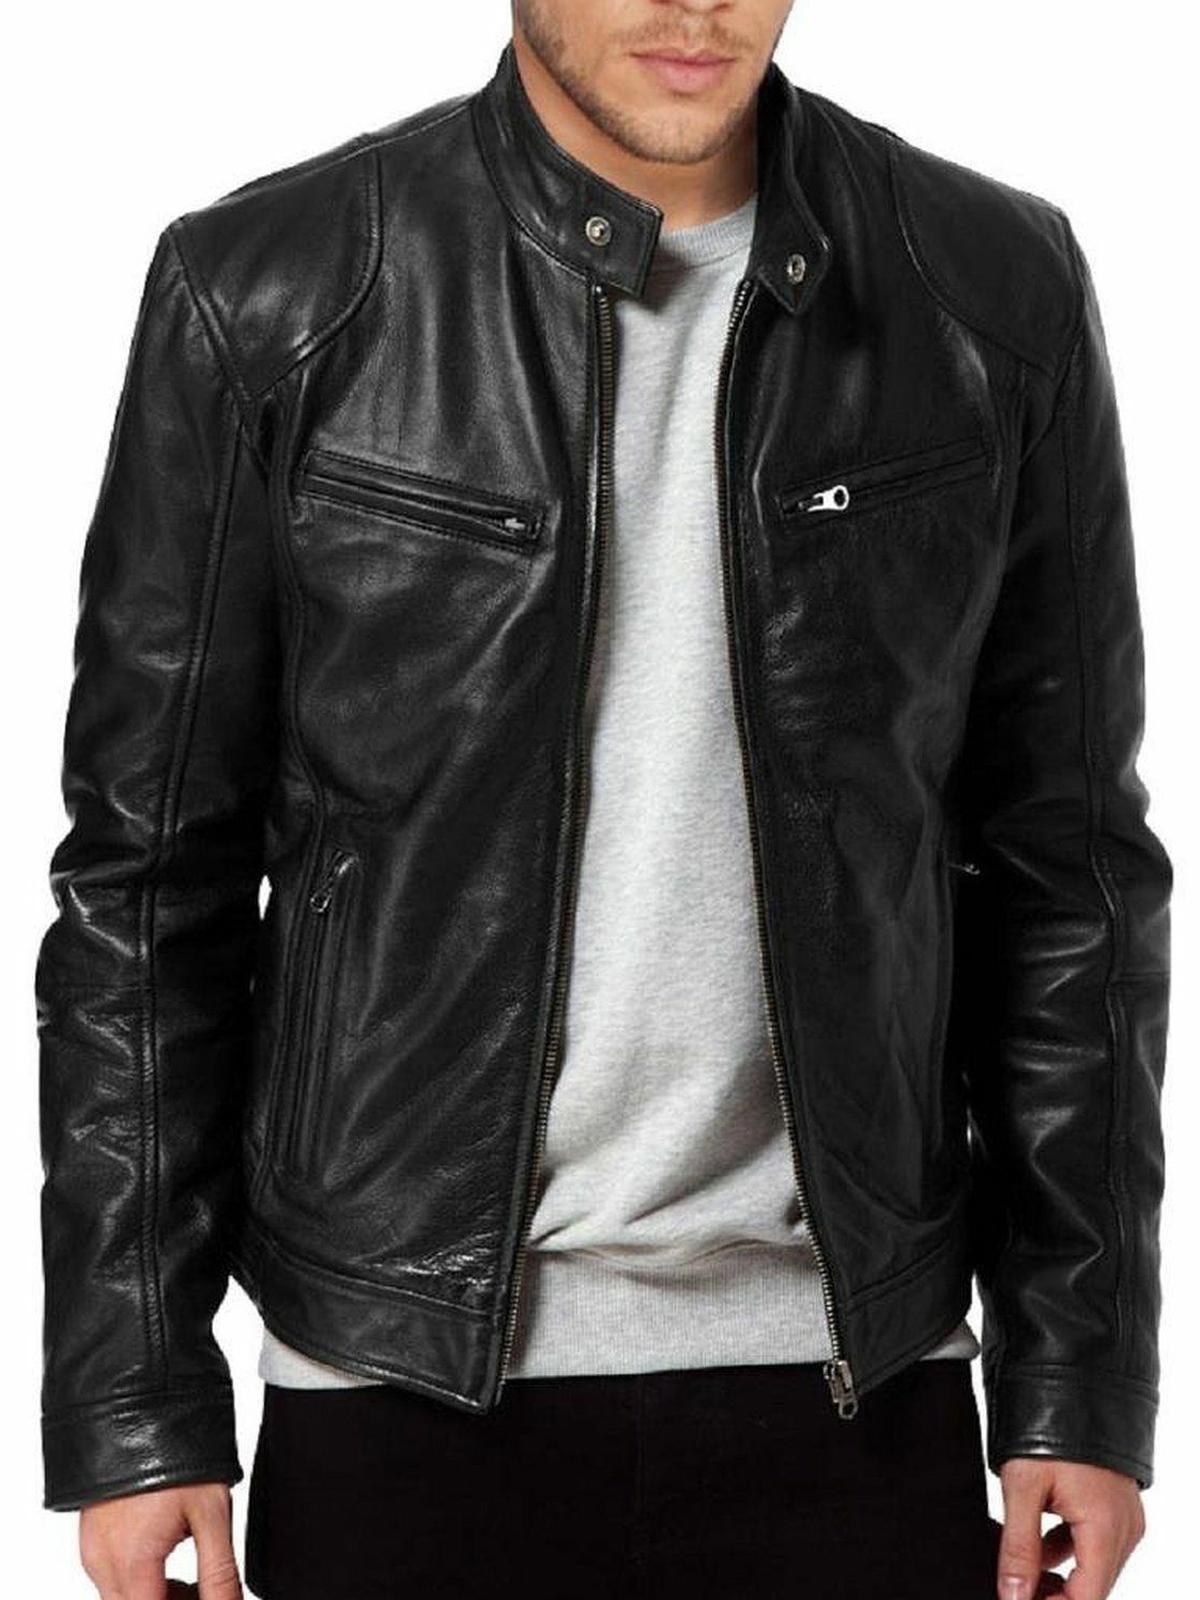 Mens SWORD Black Leather Biker Retro Jacket